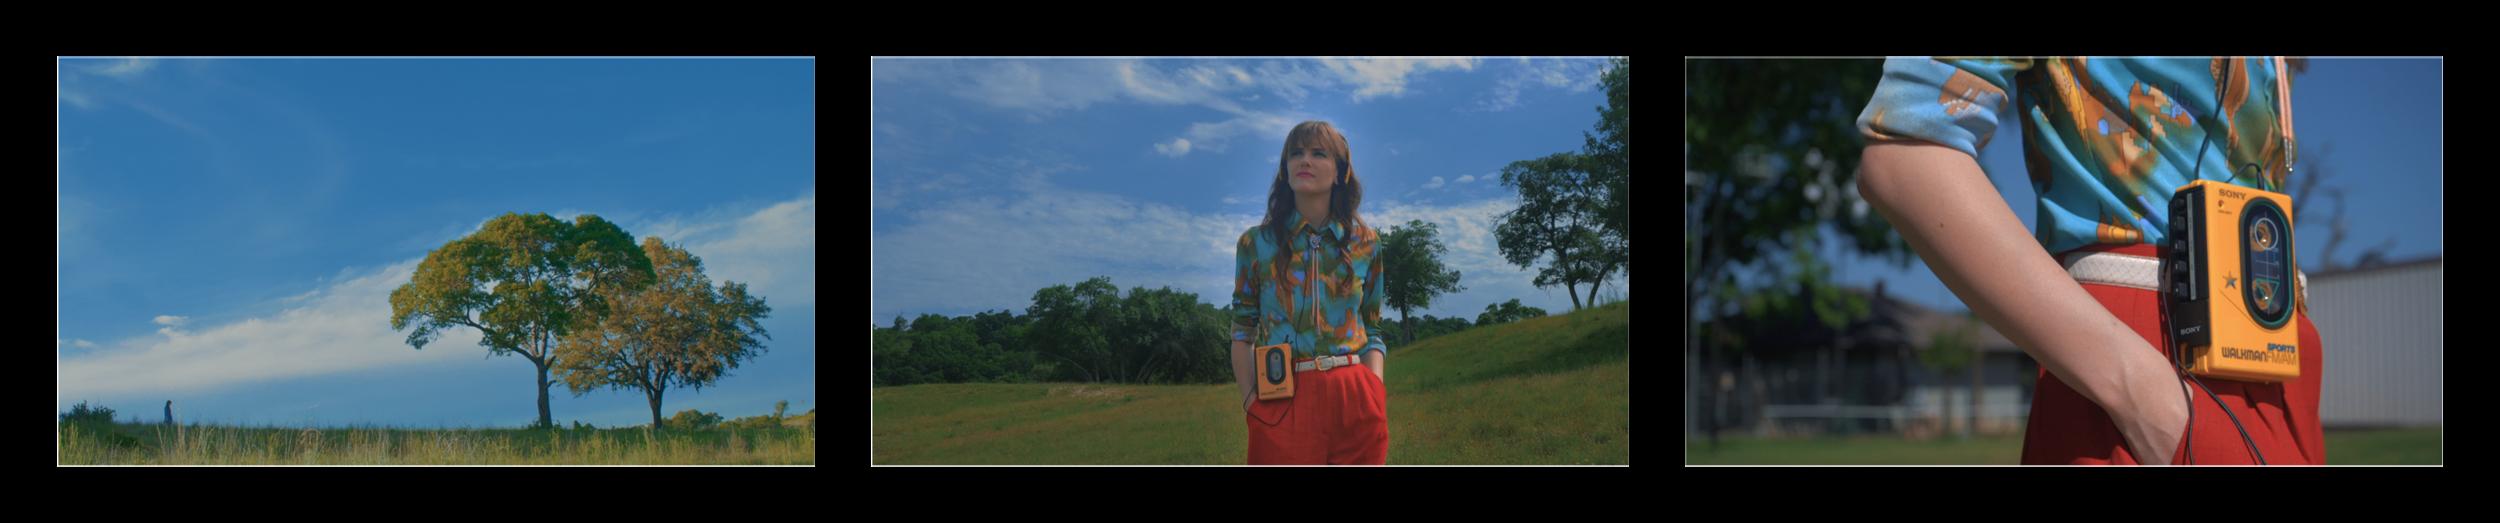 Color-Field-Frames-030.png